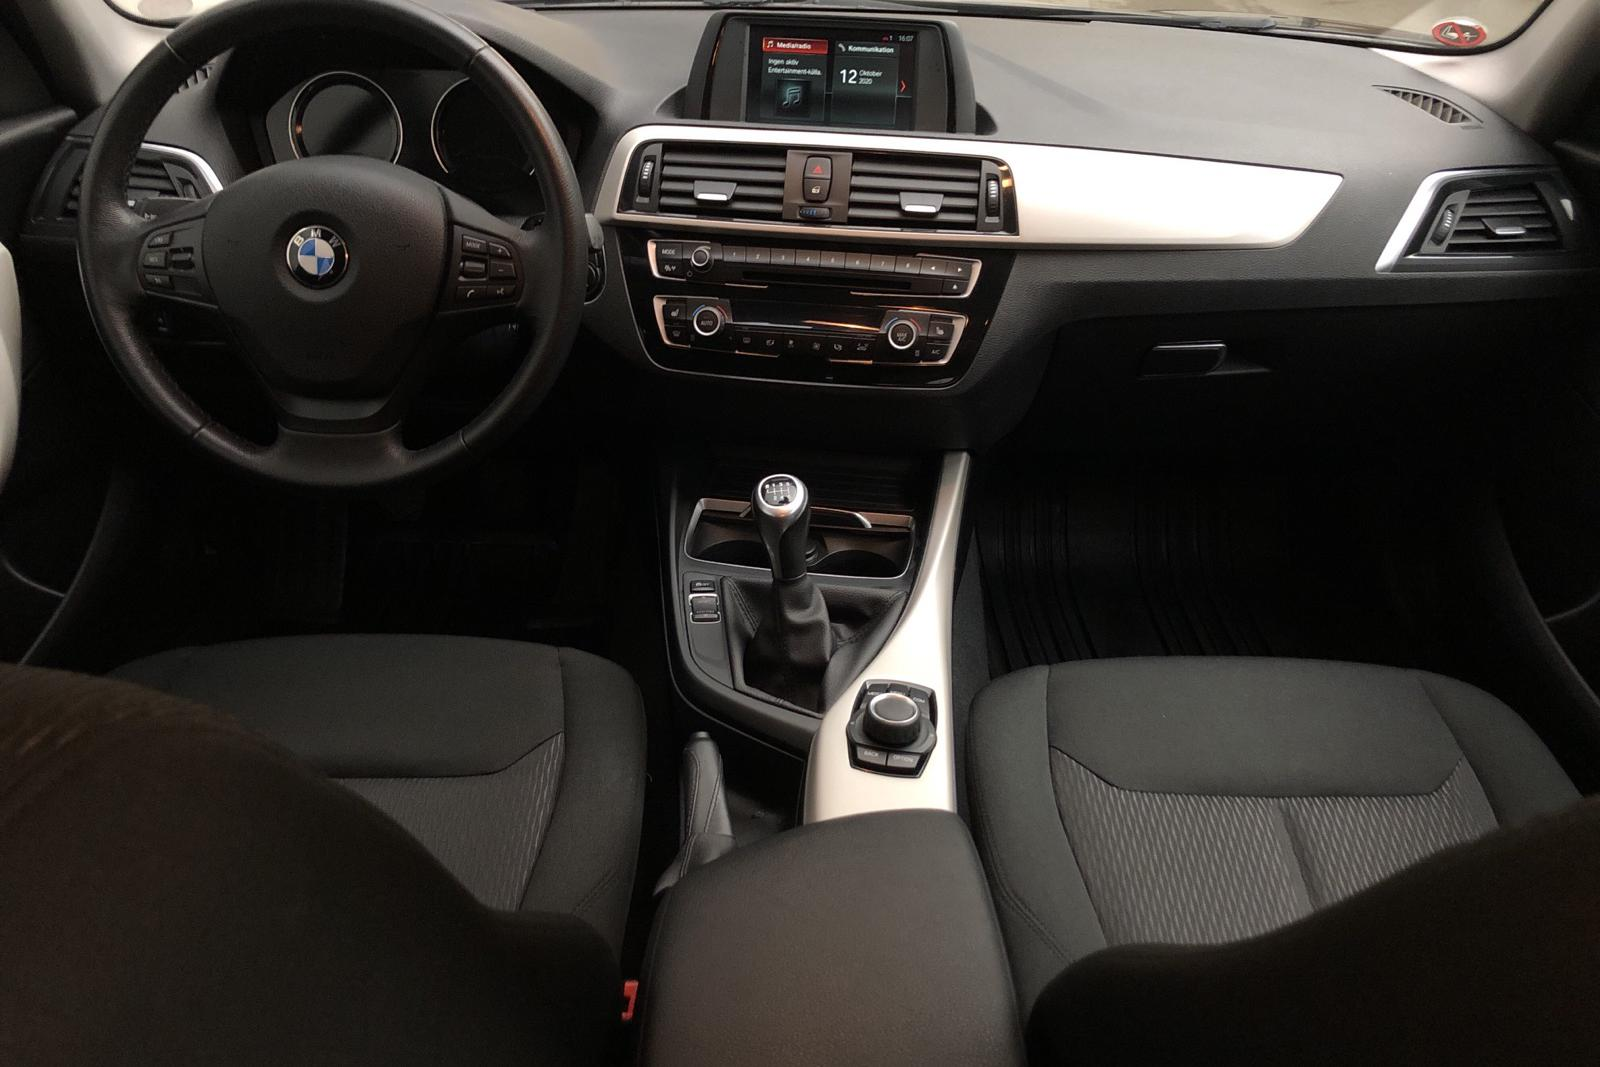 BMW 118i 5dr, F20 (136hk) - 0 km - Manual - black - 2018